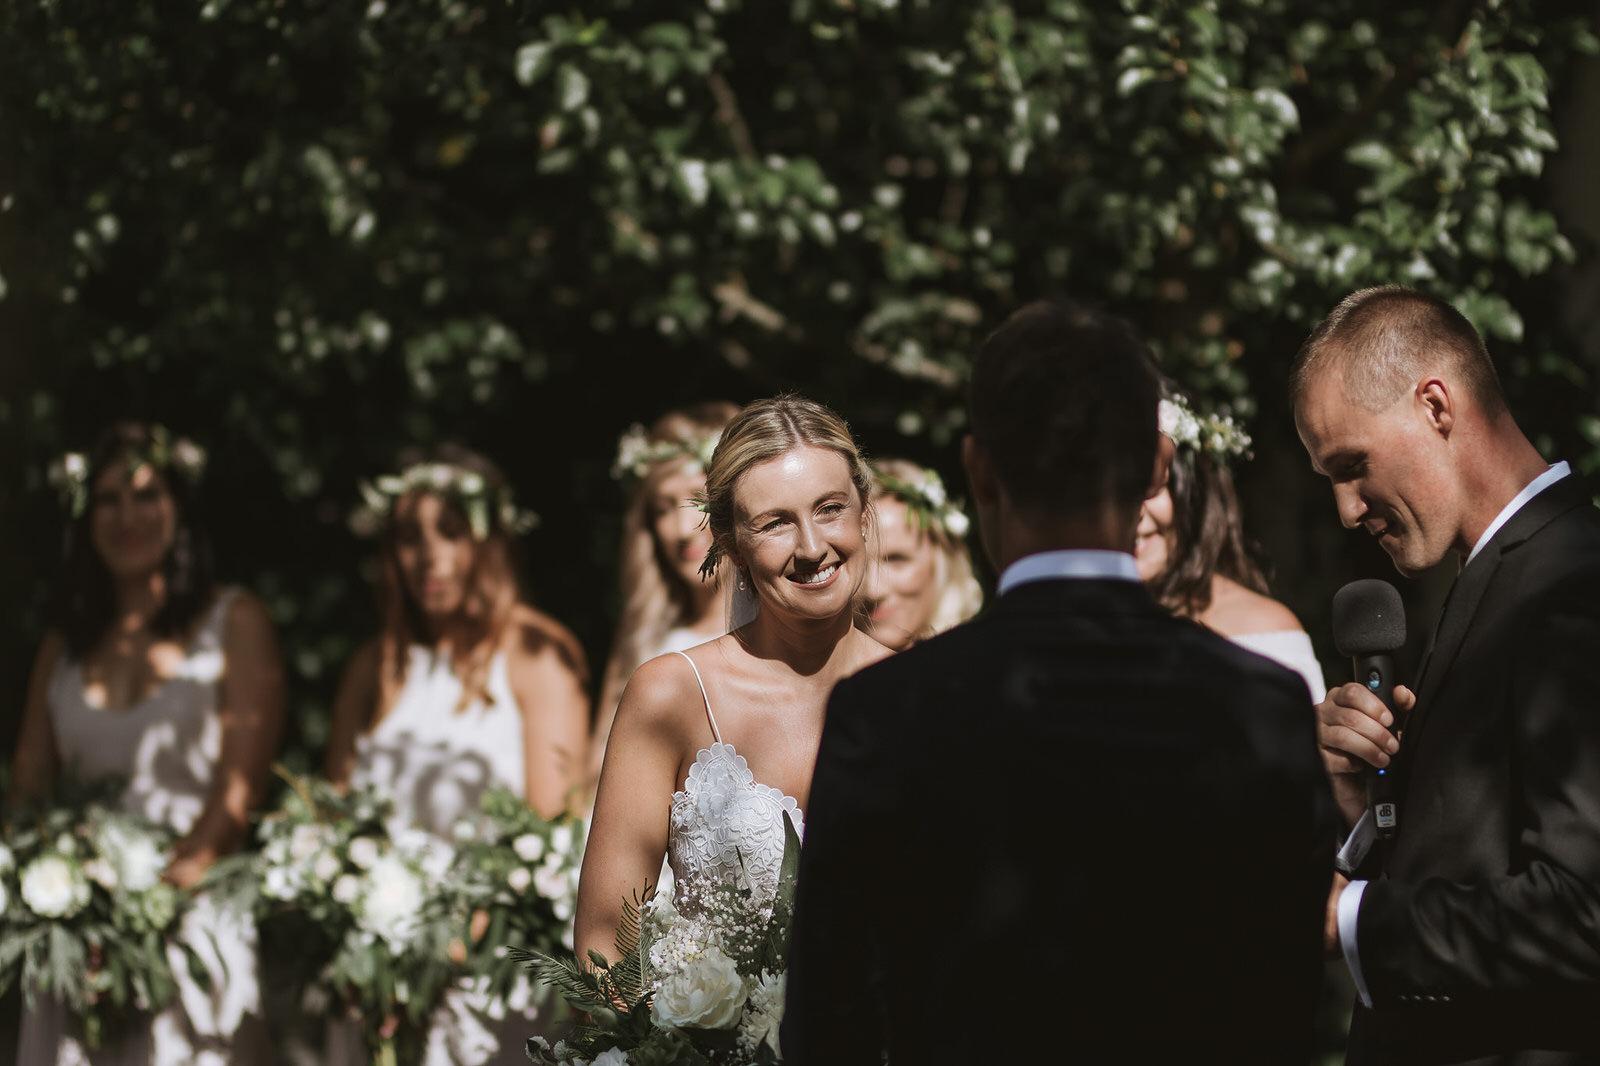 newfound-r-s-ataahua-garden-venue-tauranga-wedding-064